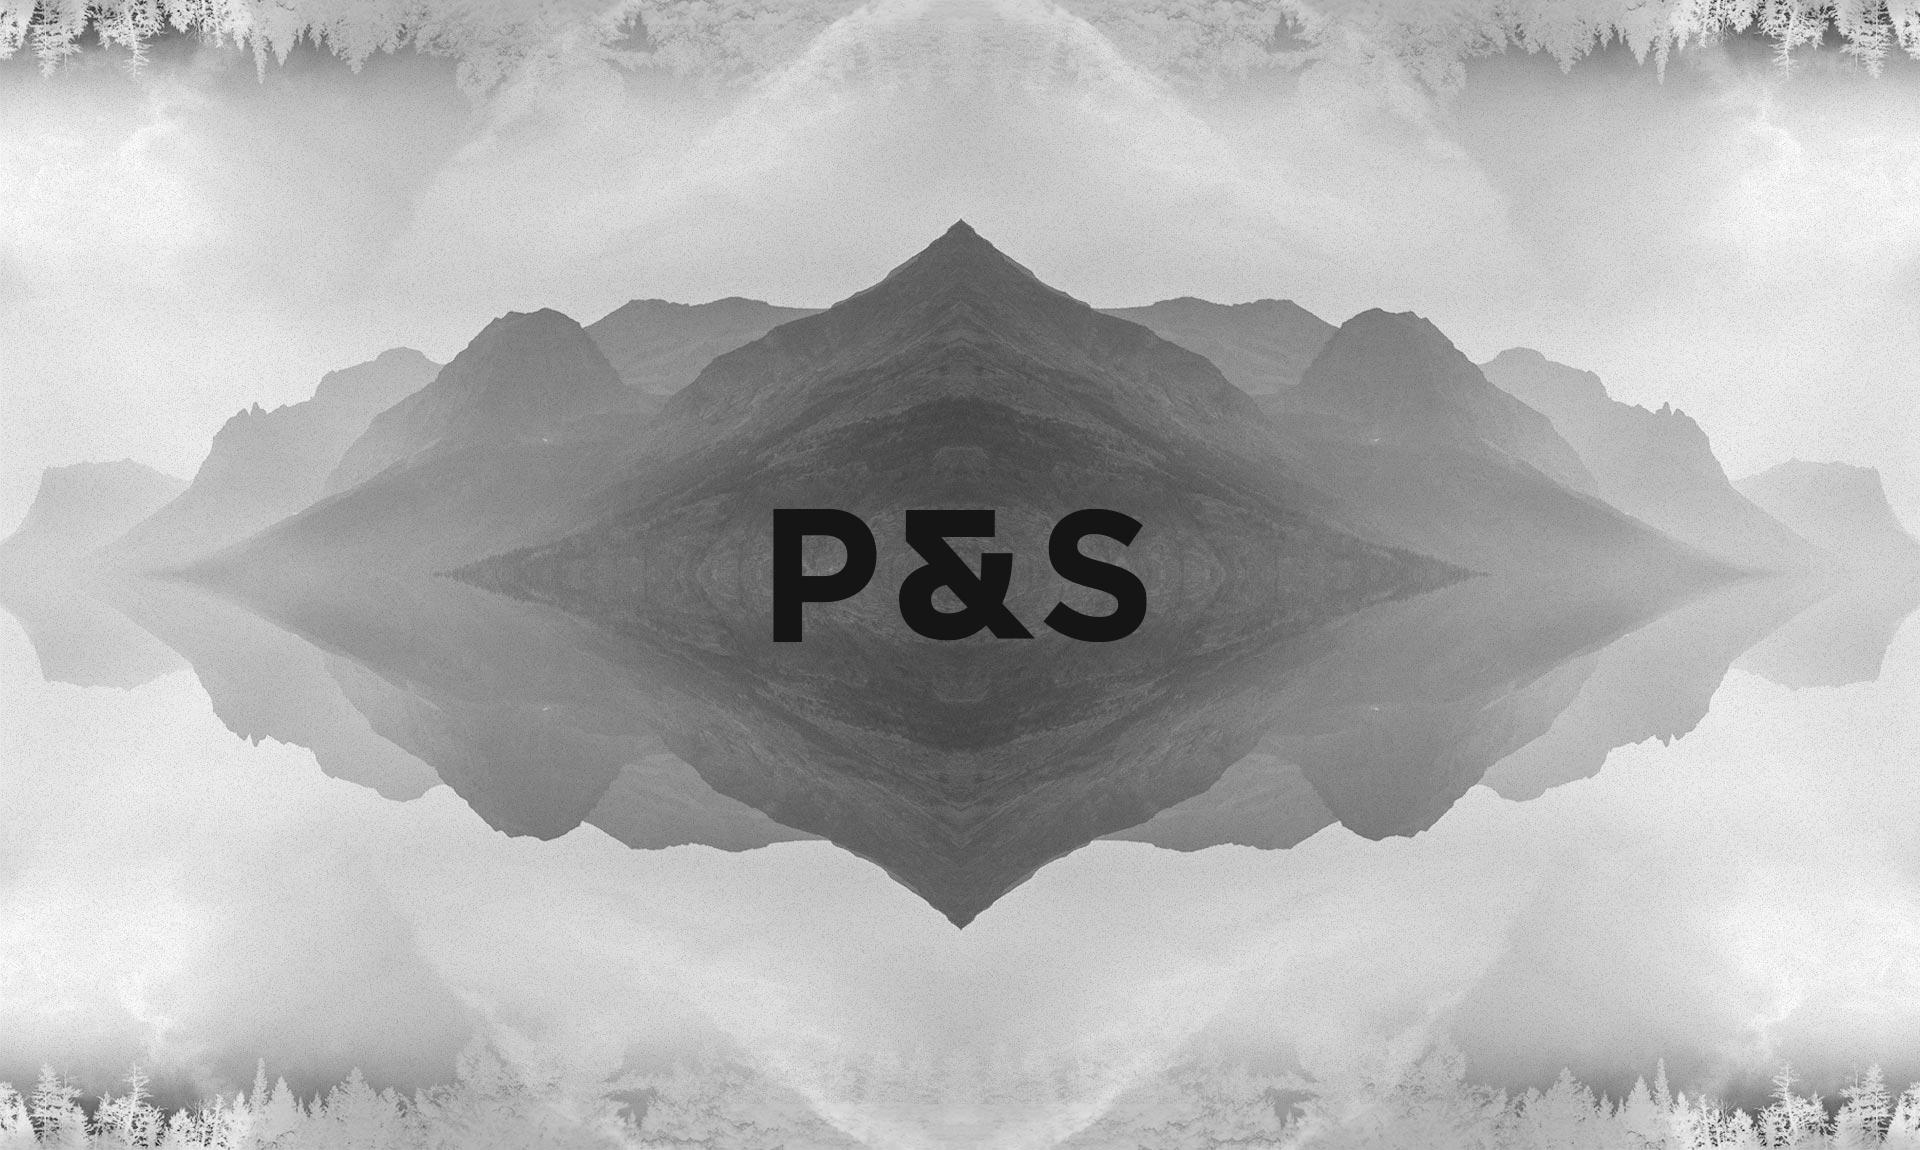 PS_Overscroll-1